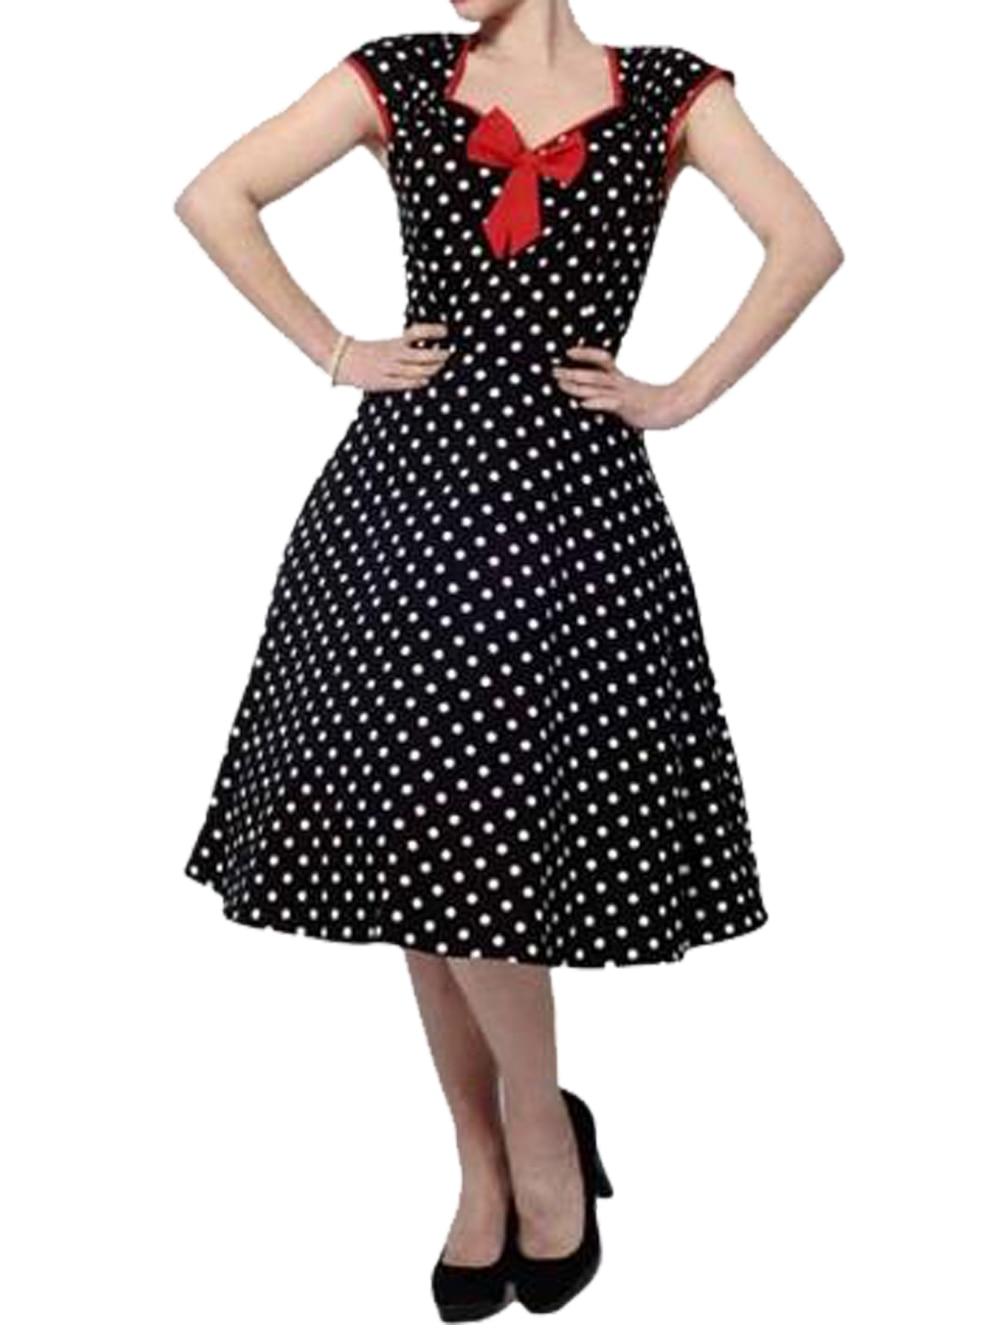 Cap Sleeve Dress Polka Dot Print Vintage 60s 50s Rockability Swing